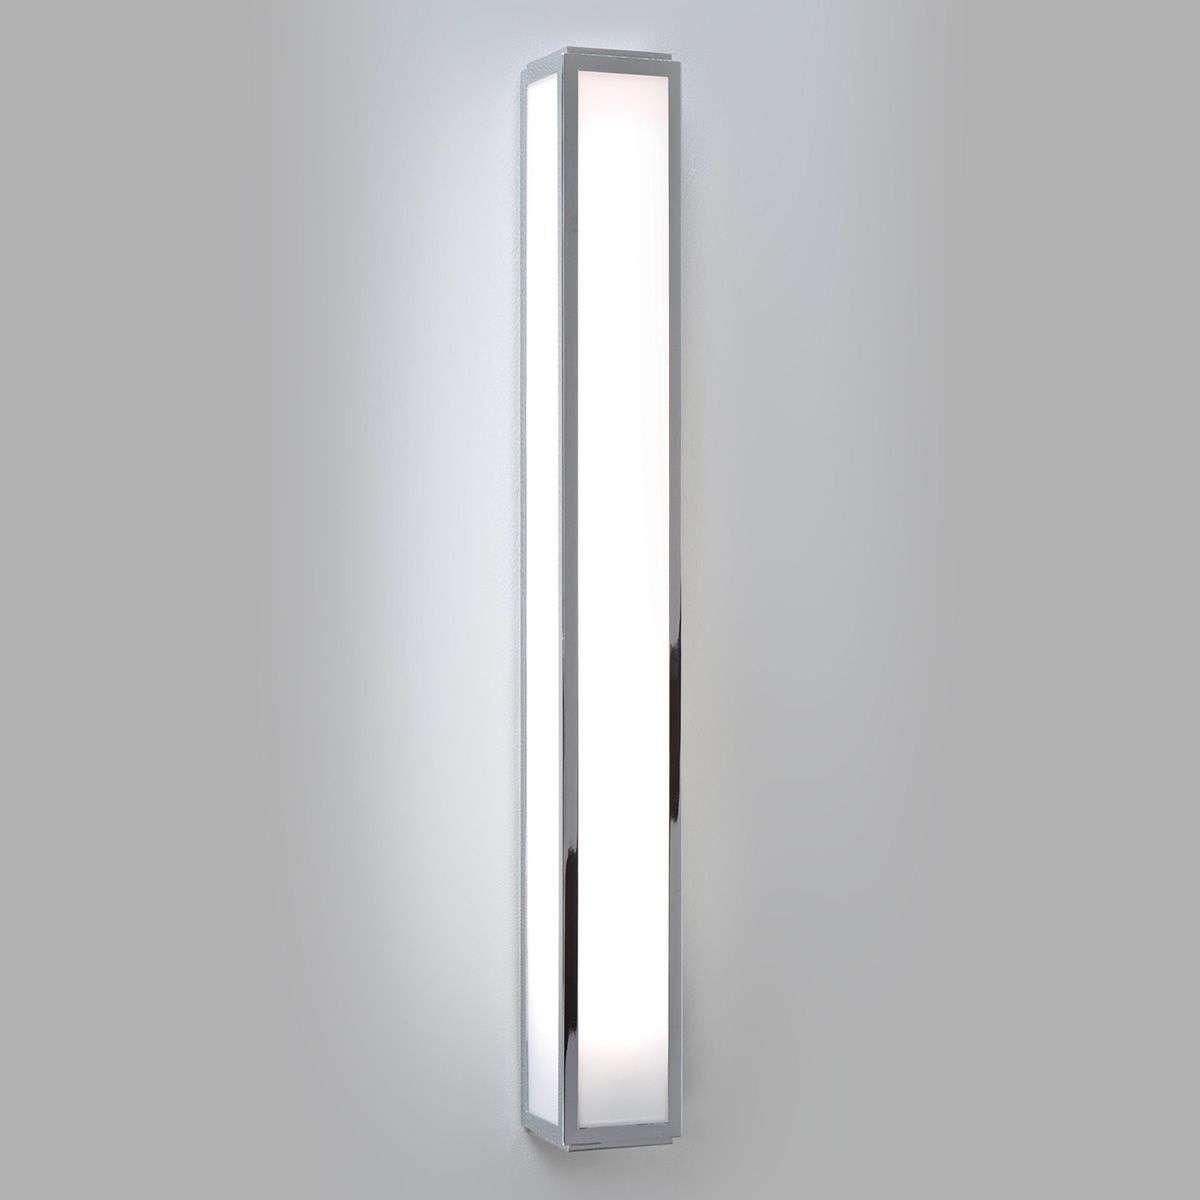 Mashiko 600 Wall Light Elegant-1020381-32